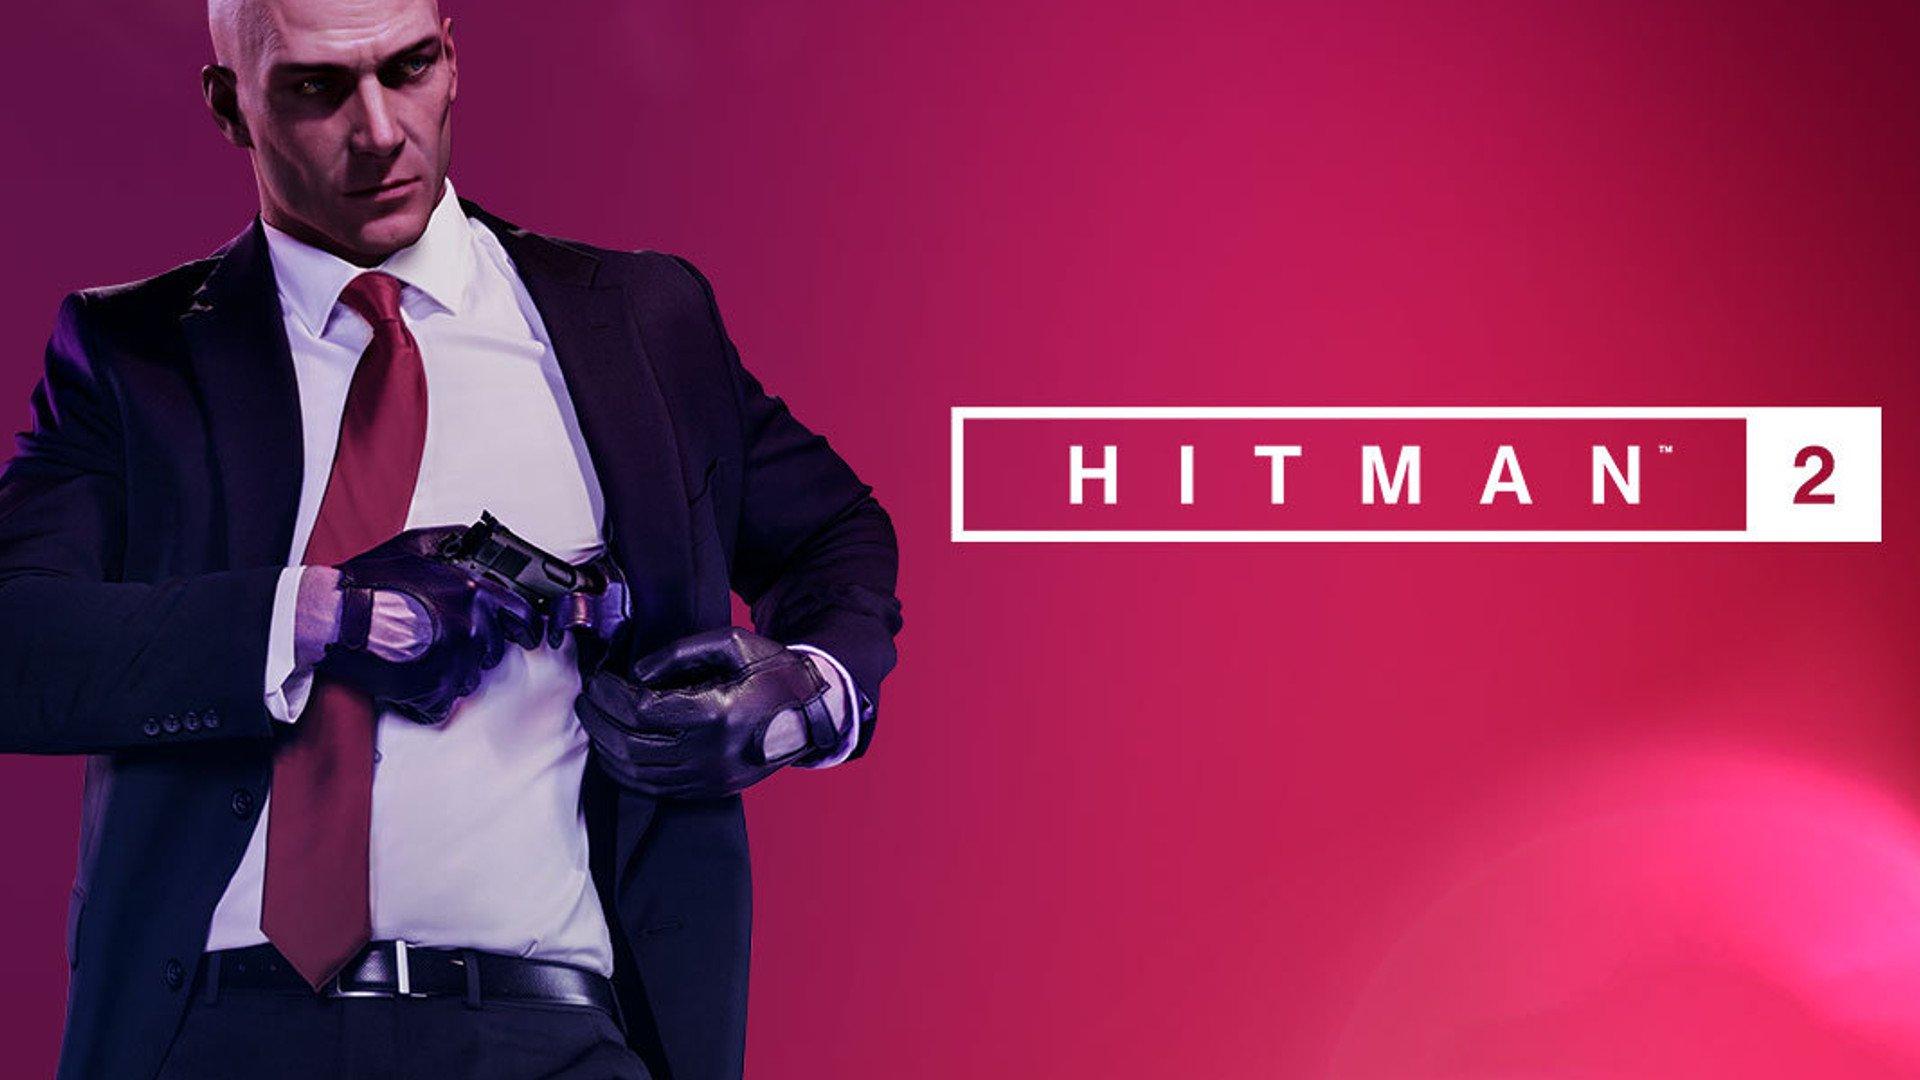 Hitman 2 has been Announced